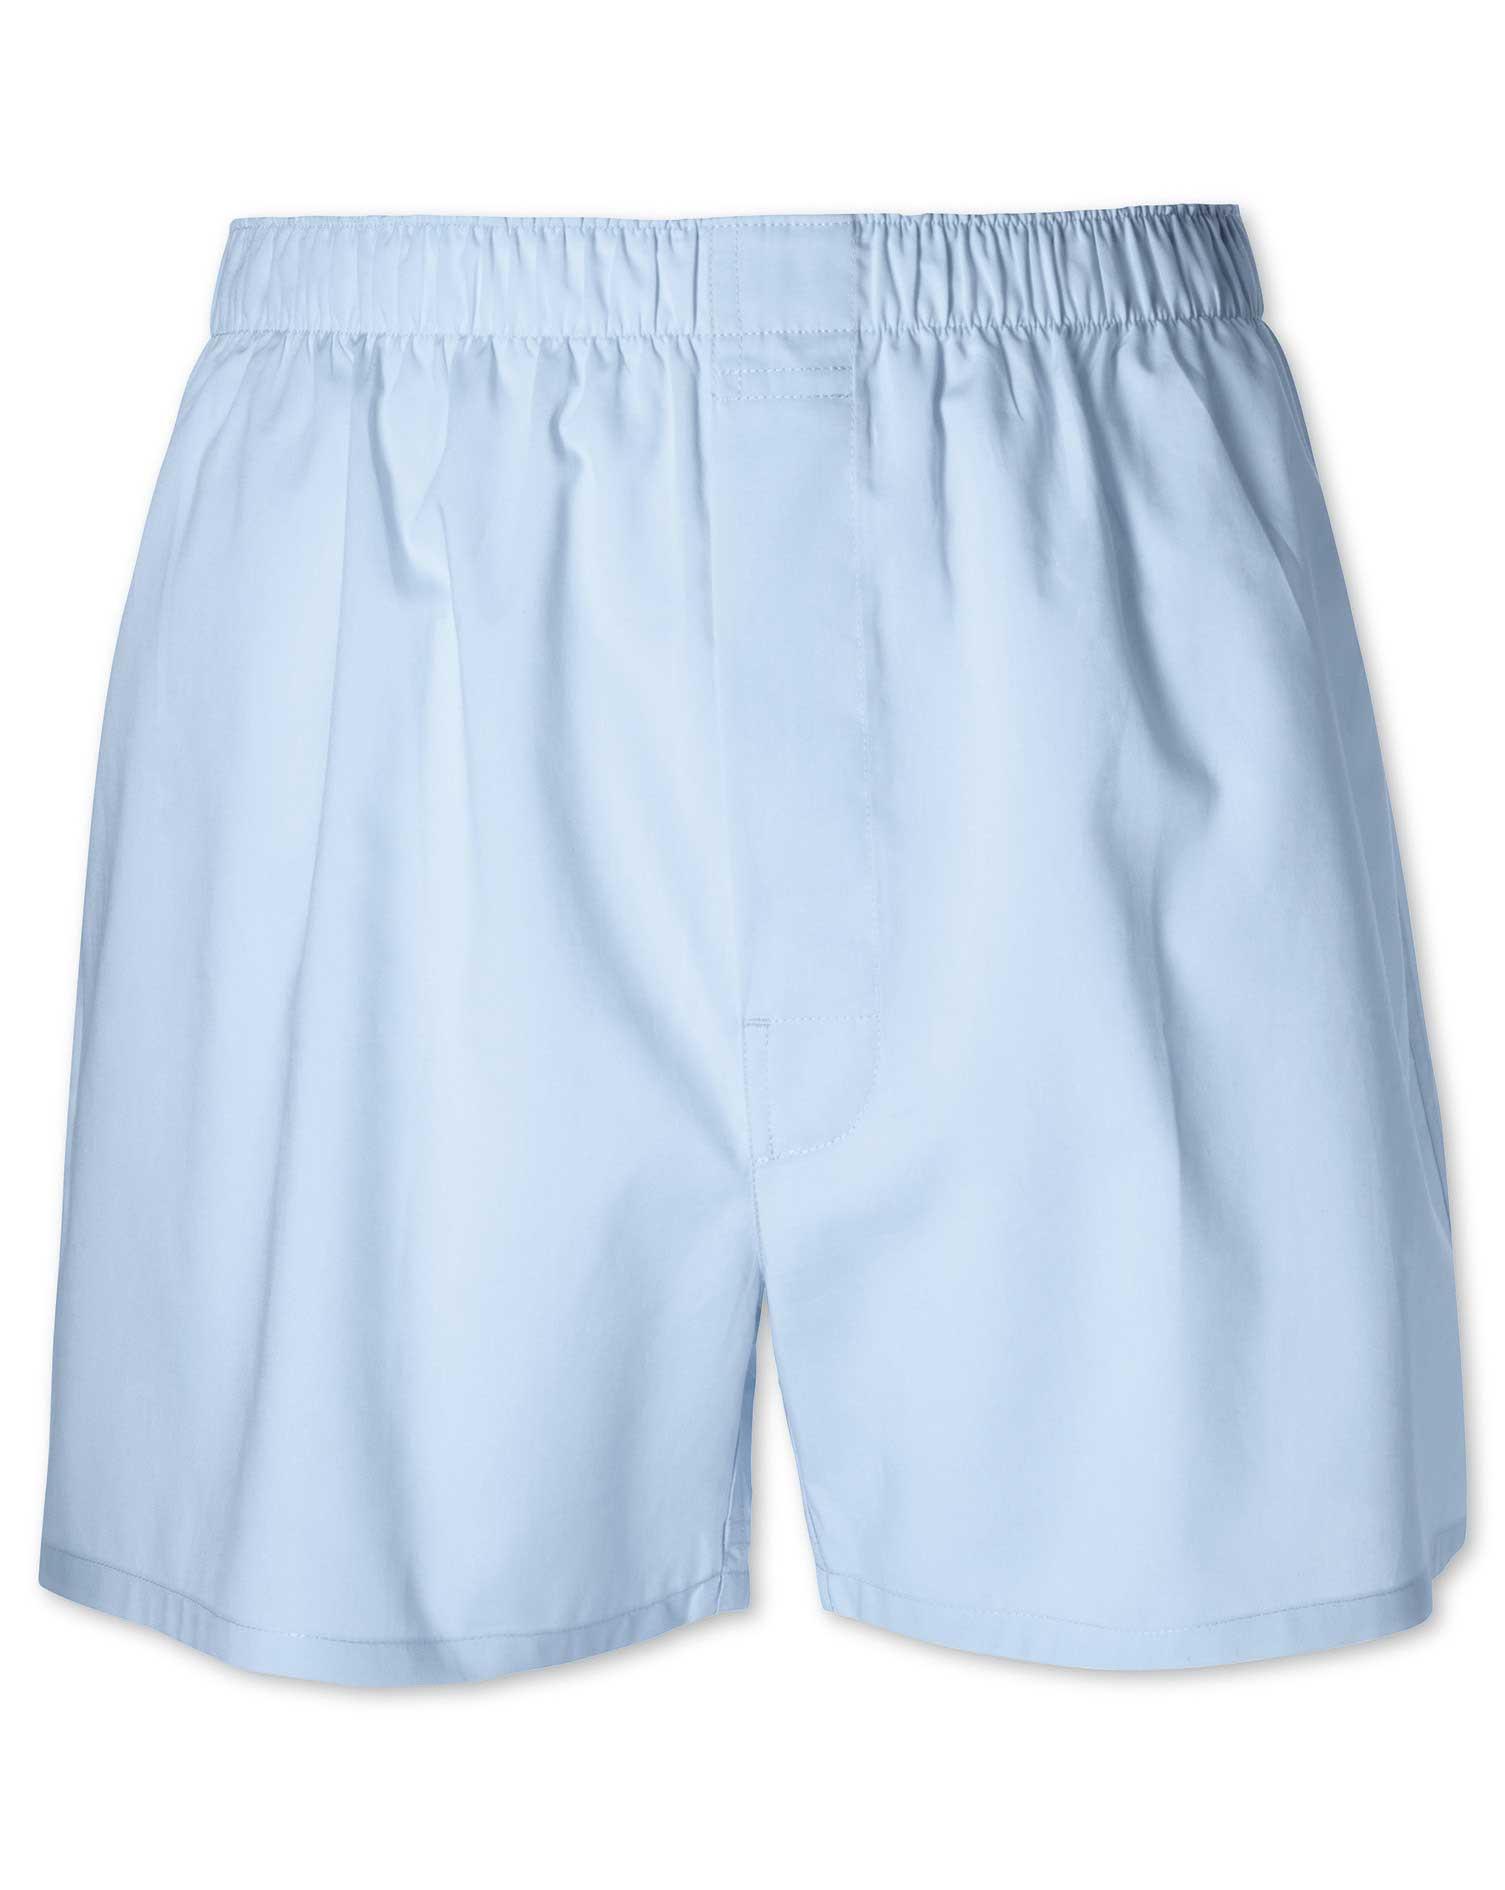 Plain Sky Blue Woven Boxers Size XXL by Charles Tyrwhitt